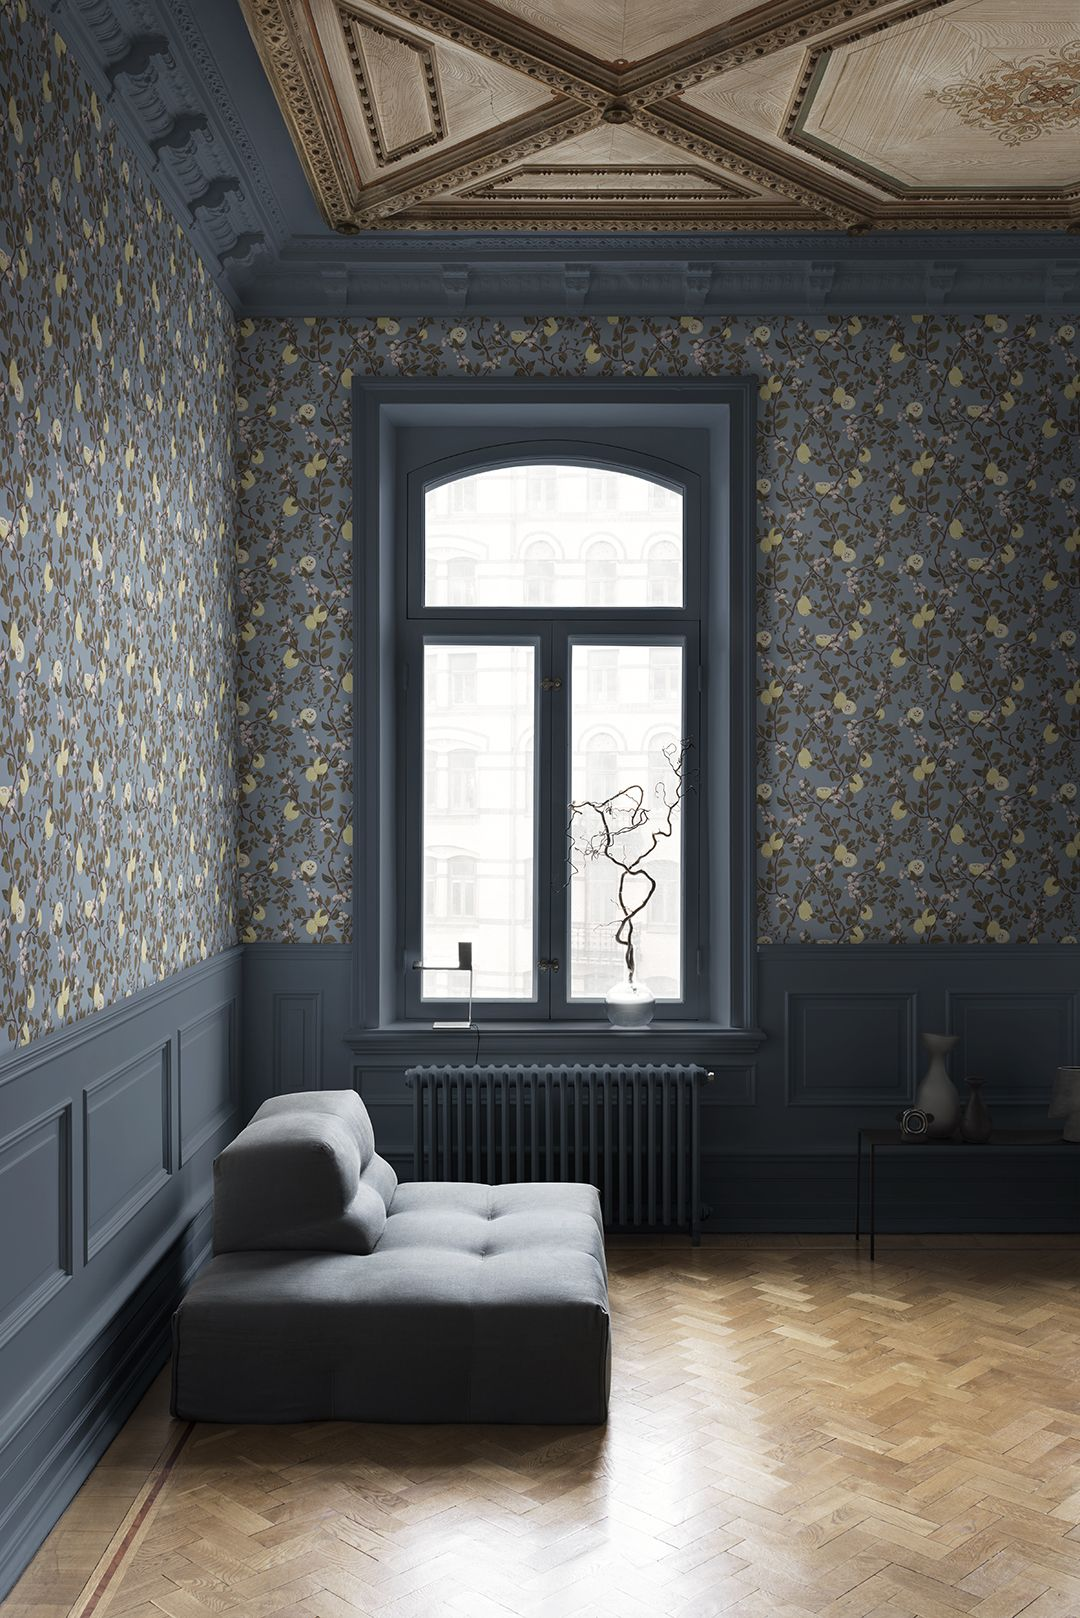 Floral Wallpaper In 2020 Blue Wallpaper Living Room Wallp